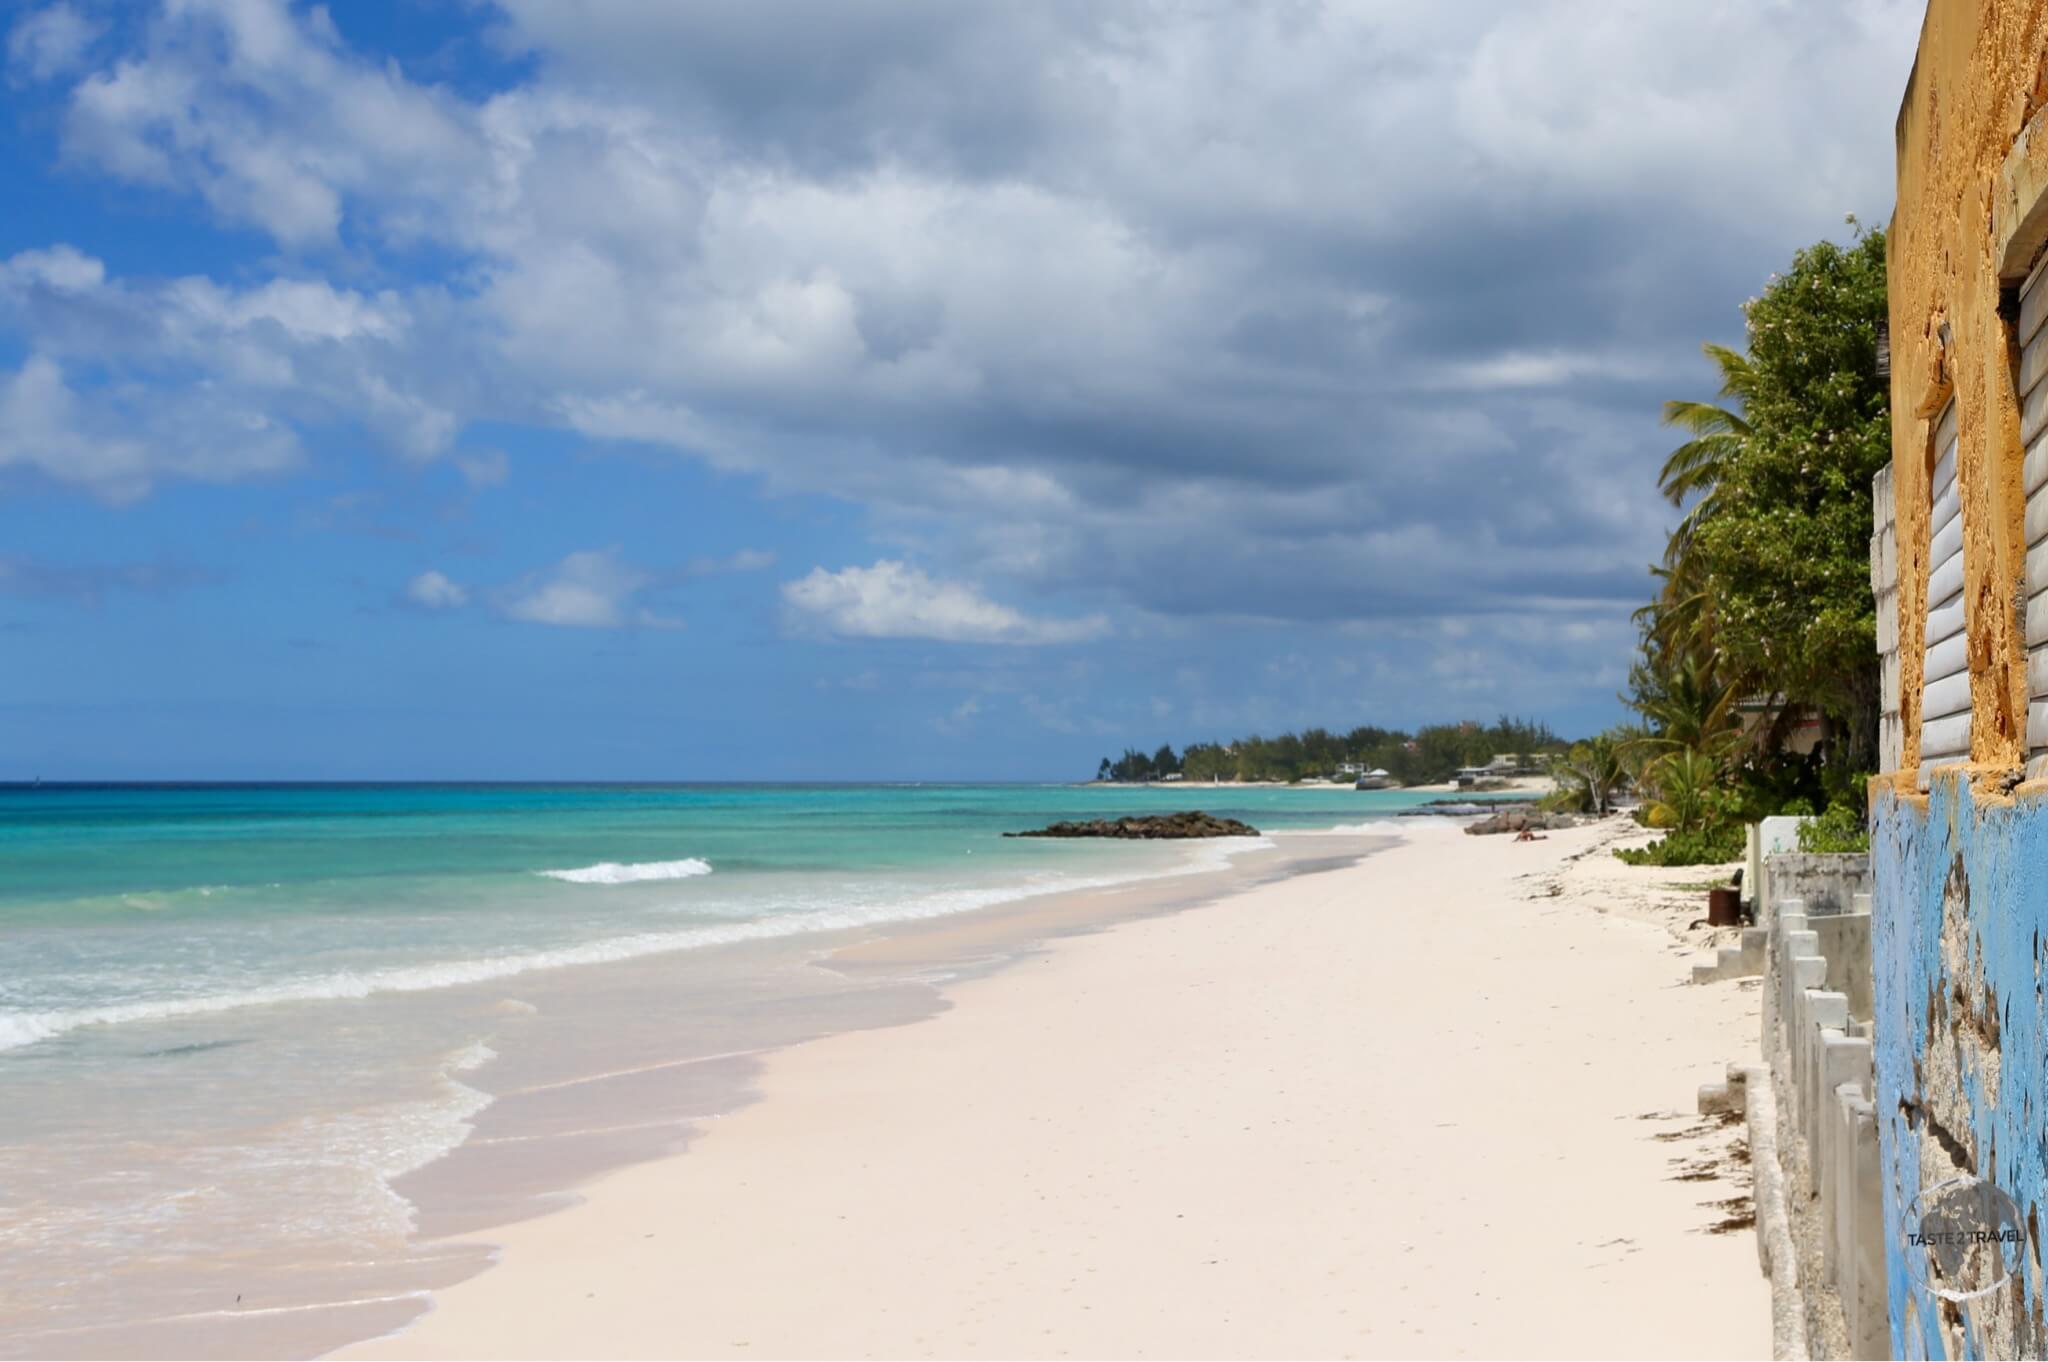 Typical west coast beach.